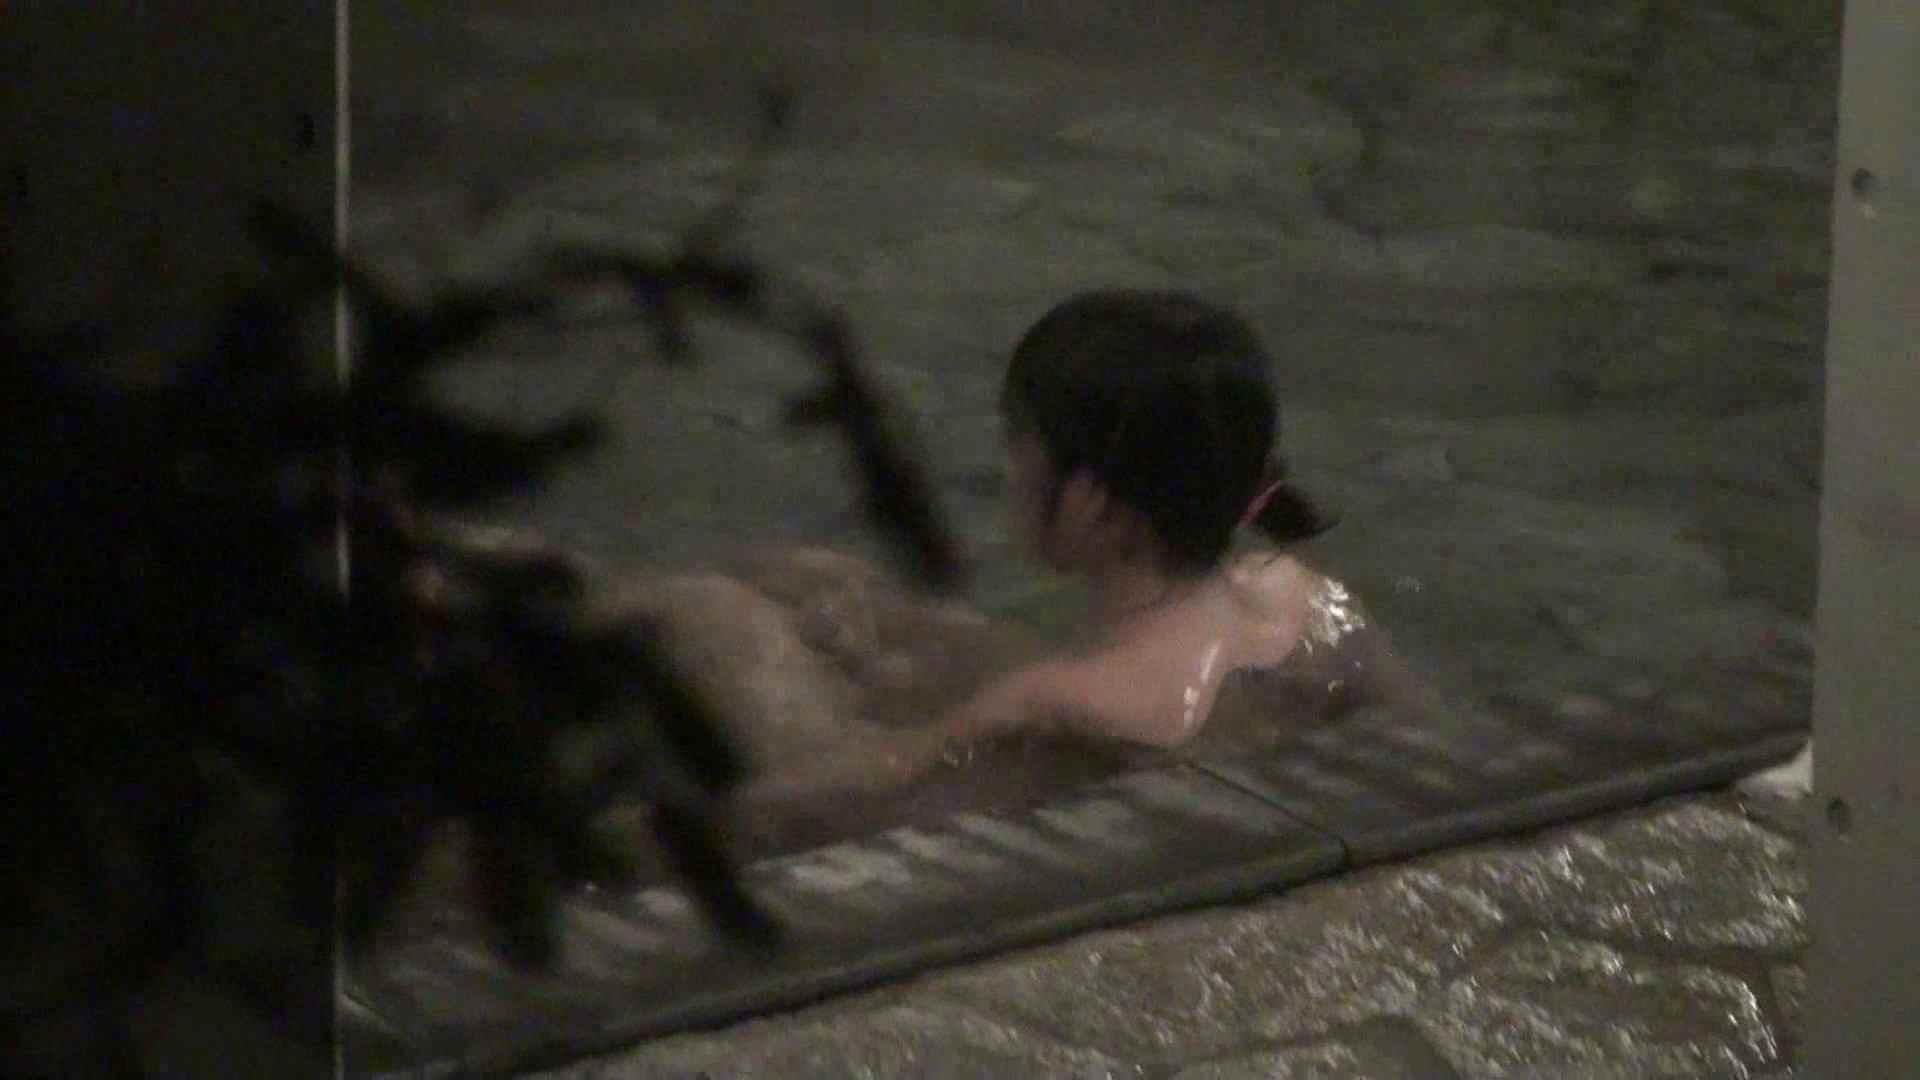 Aquaな露天風呂Vol.343 0   0  83連発 77